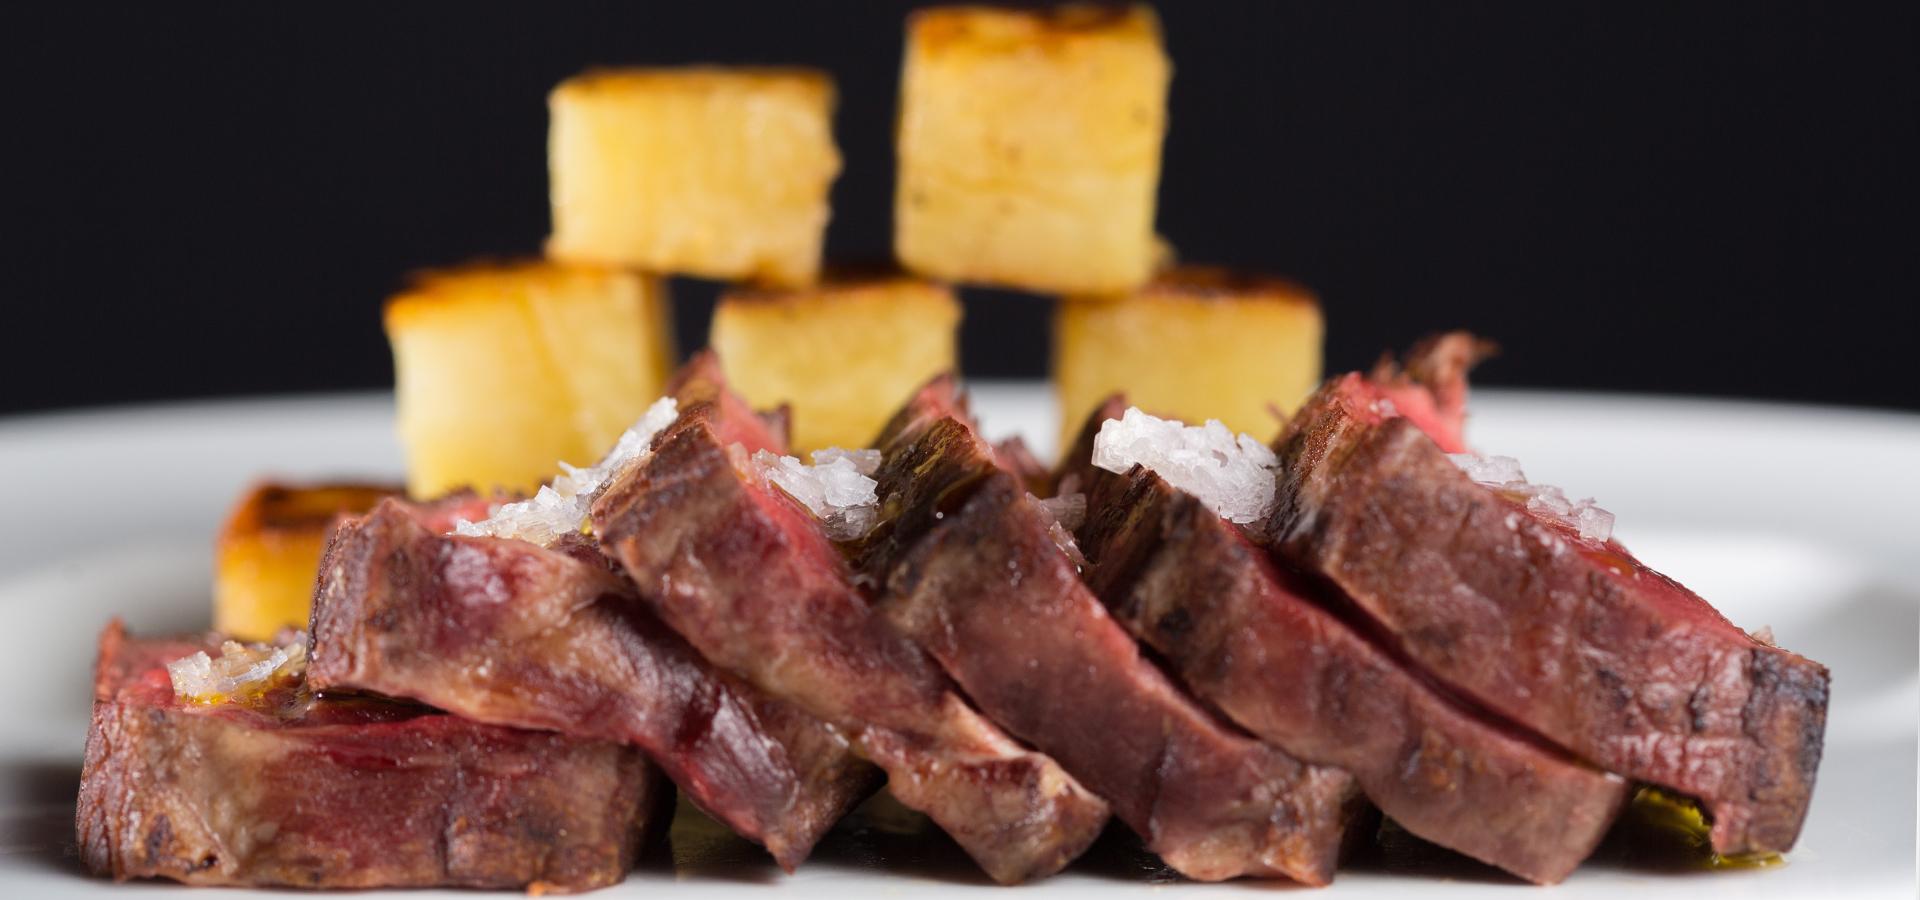 bistecca1-copia